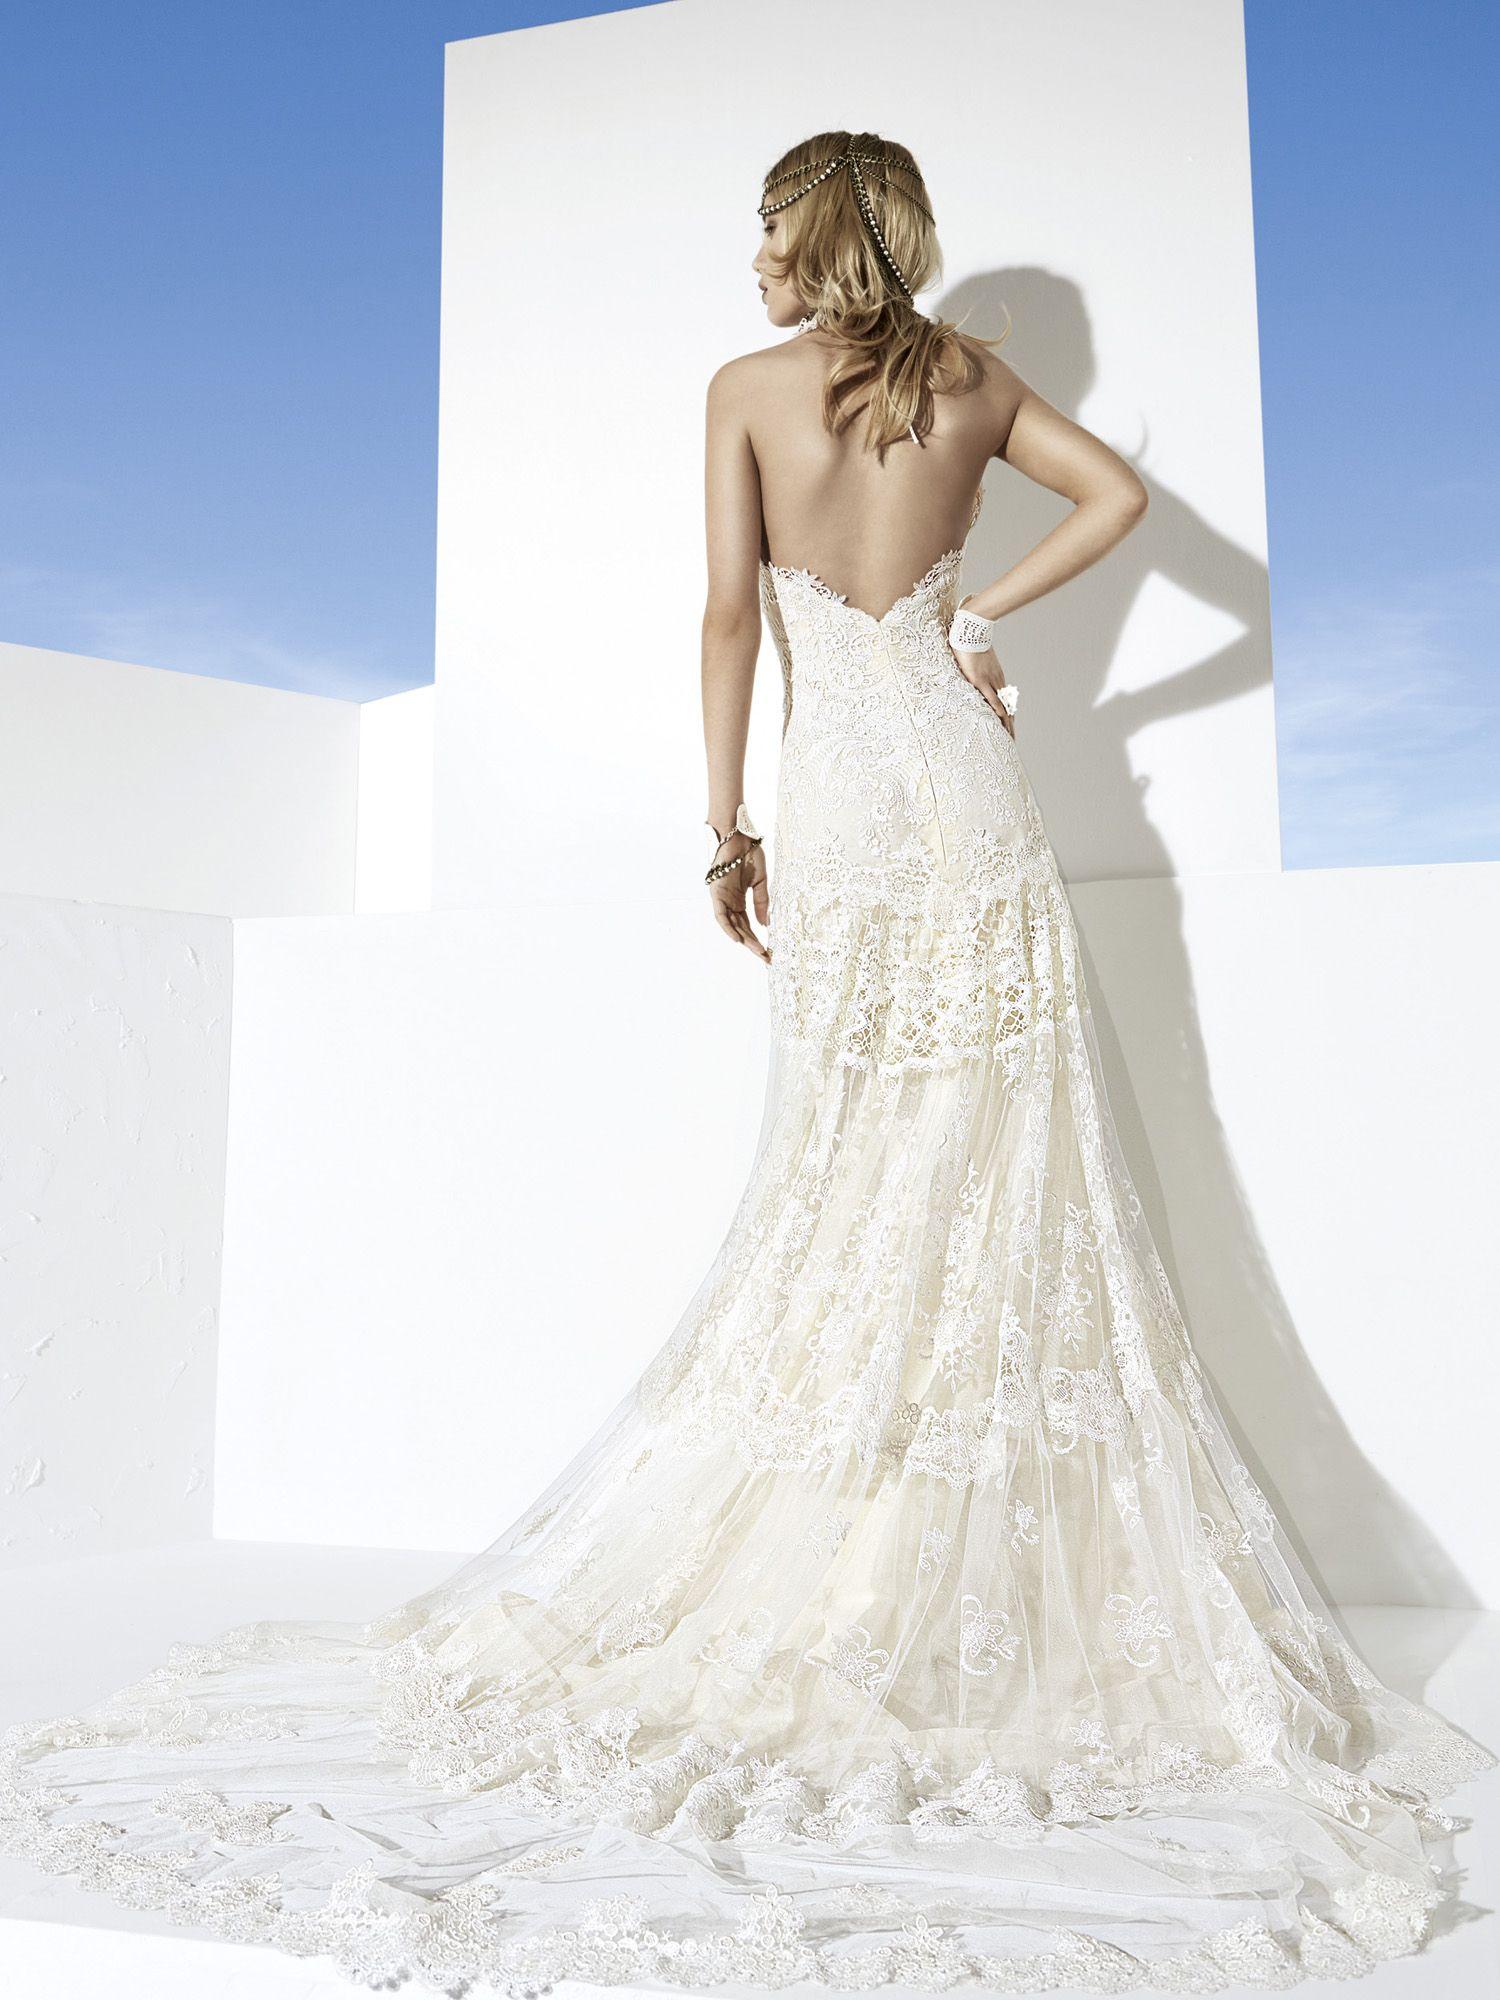 Martinica yolancris boho girl back view weddings the dress